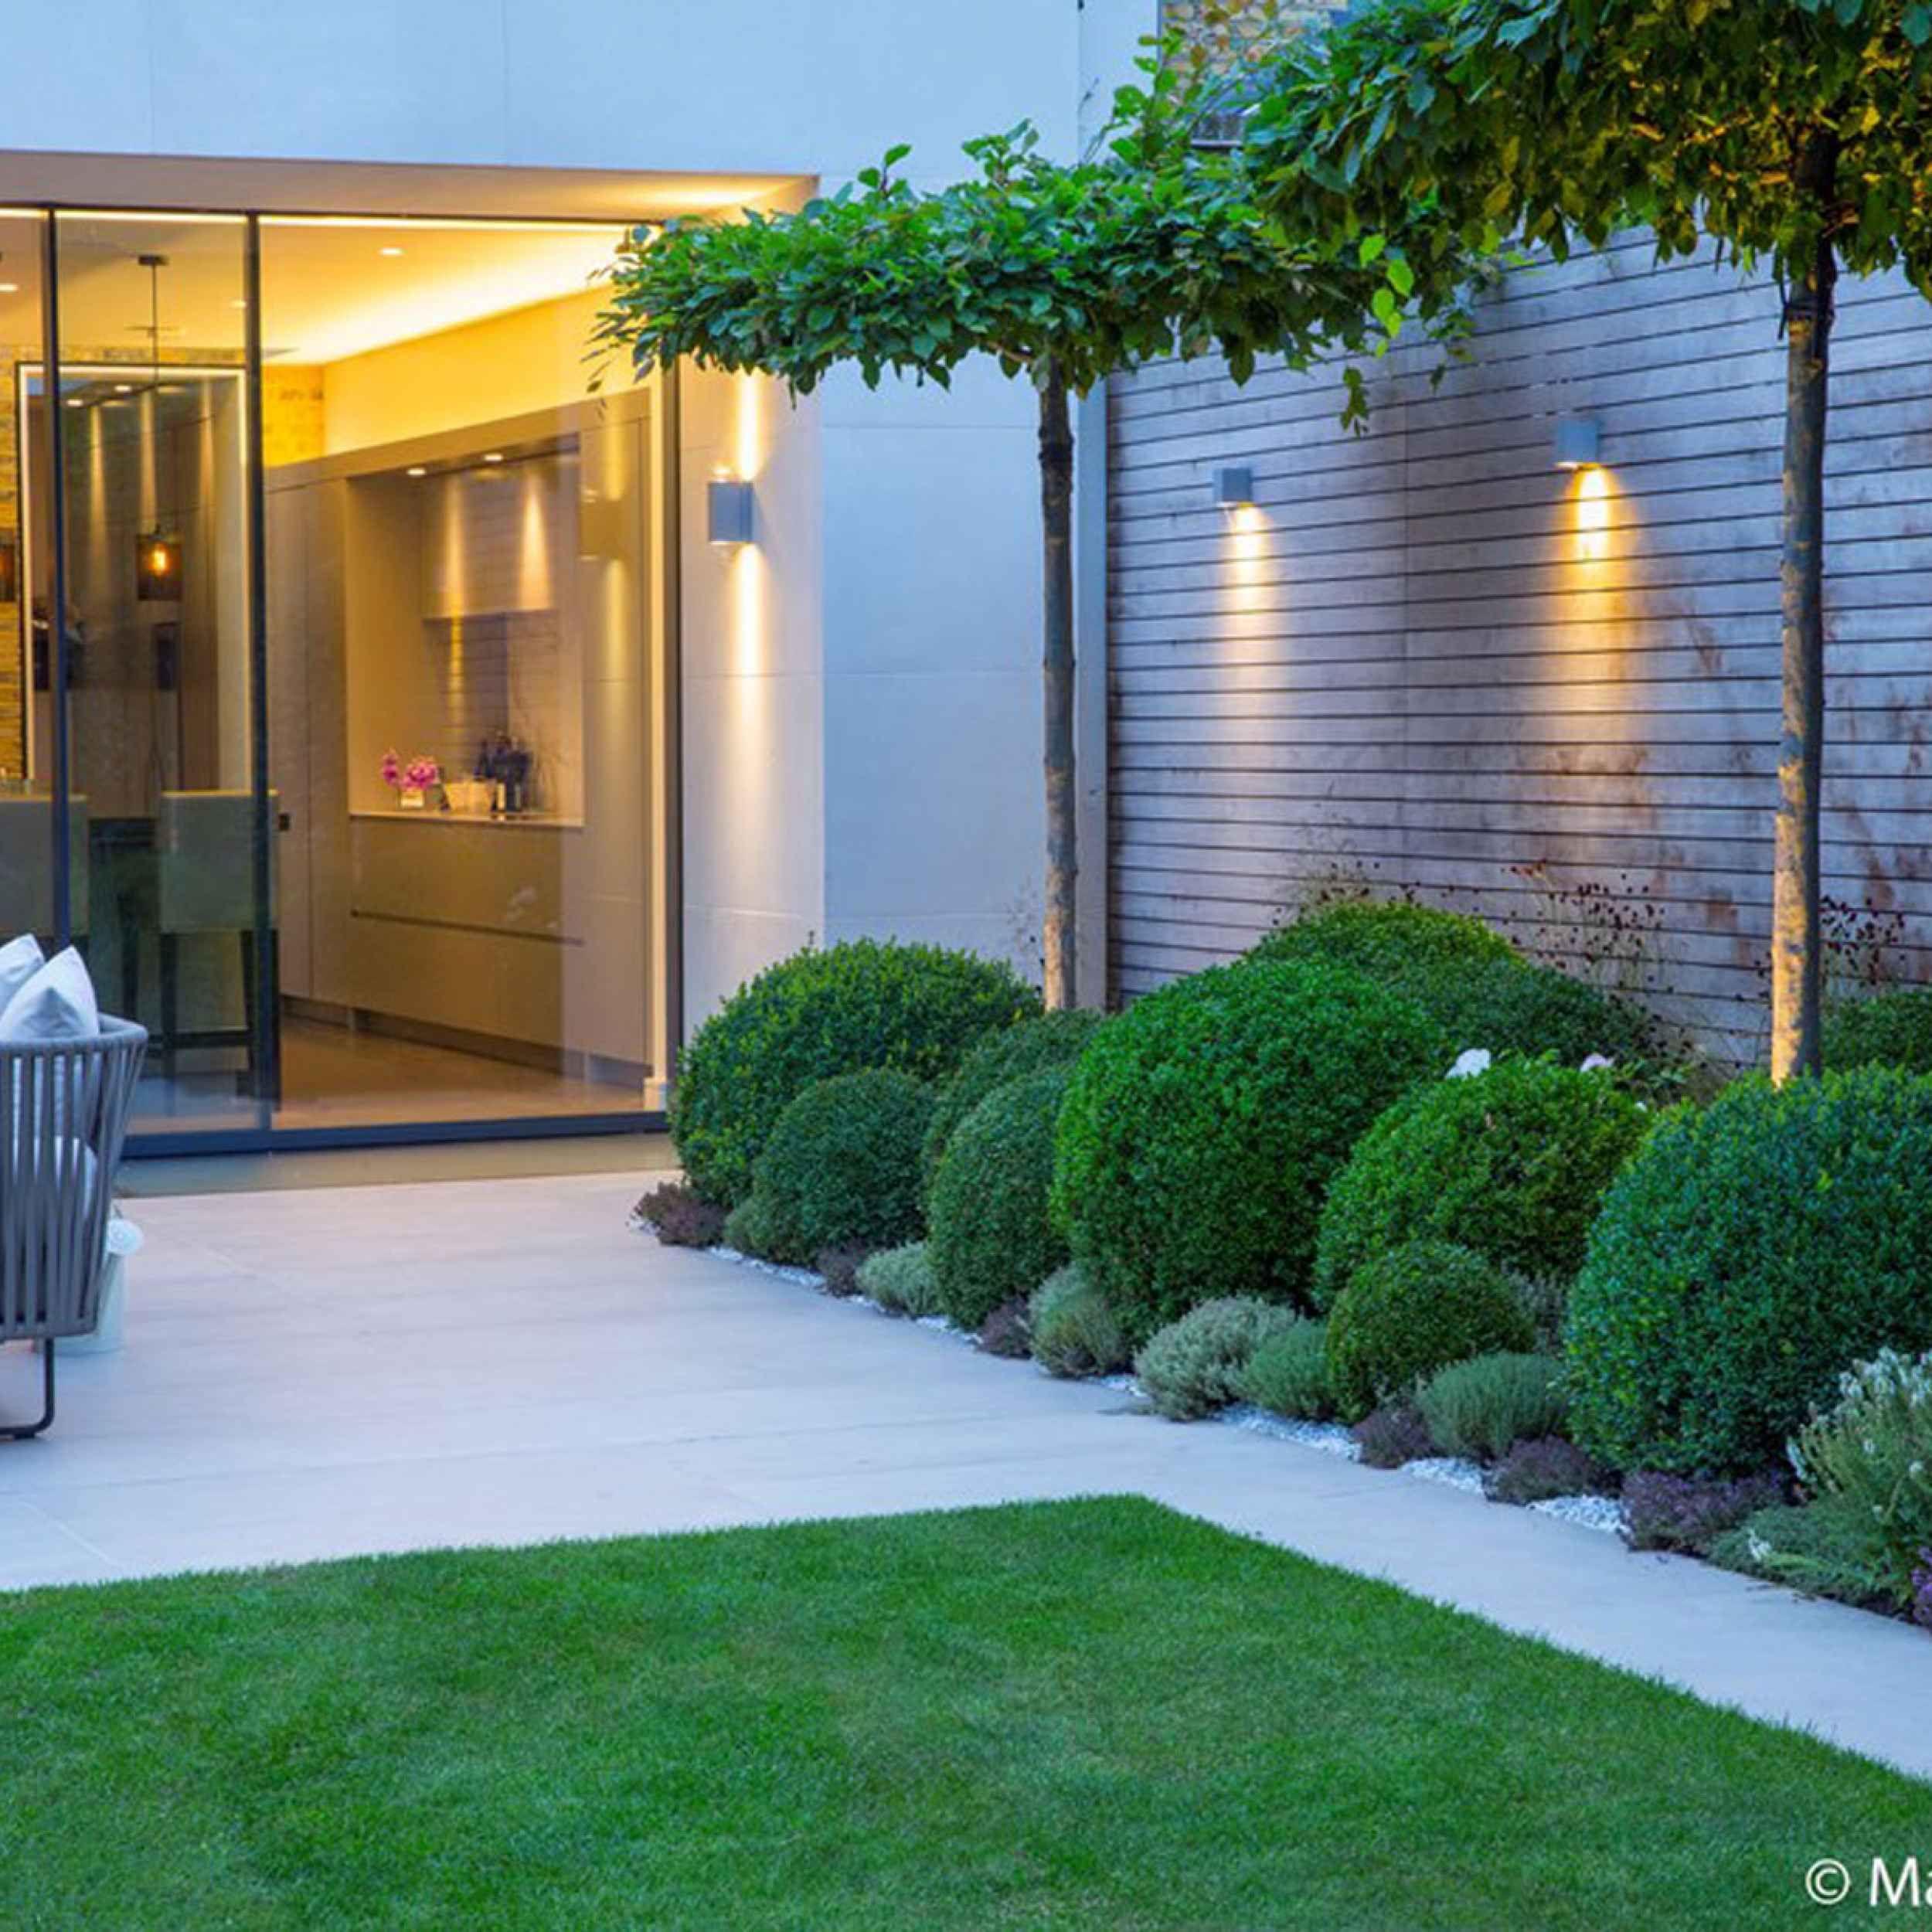 Wandsworth Garden By Matt Keightley And Rosebank Landscaping Photography By Marianne Majerus 11 Modern Planting Modern Garden Design Contemporary Garden Design